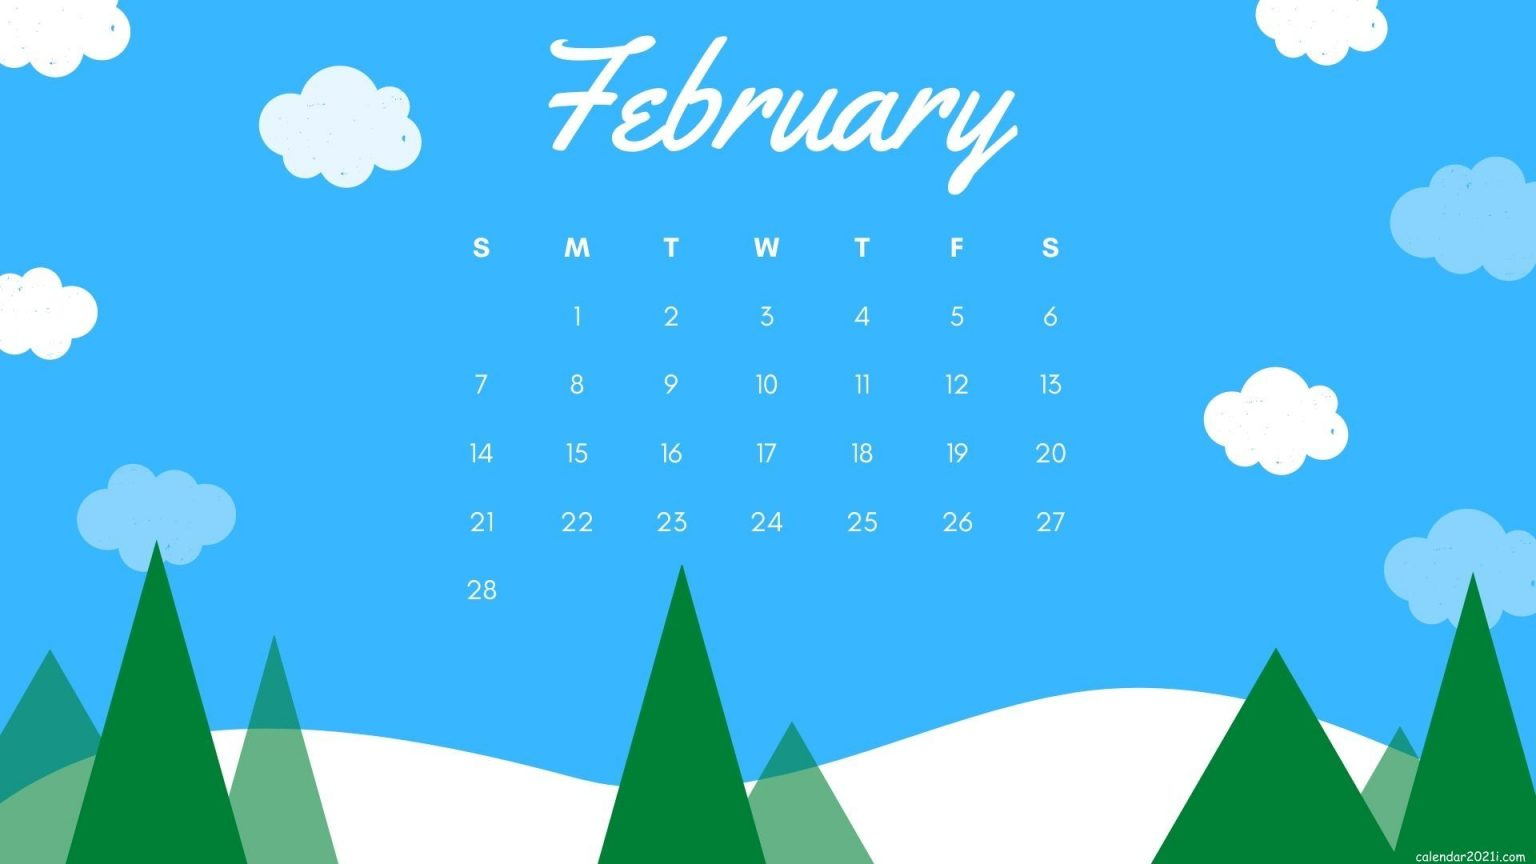 Free February 2021 Calendar Wallpaper